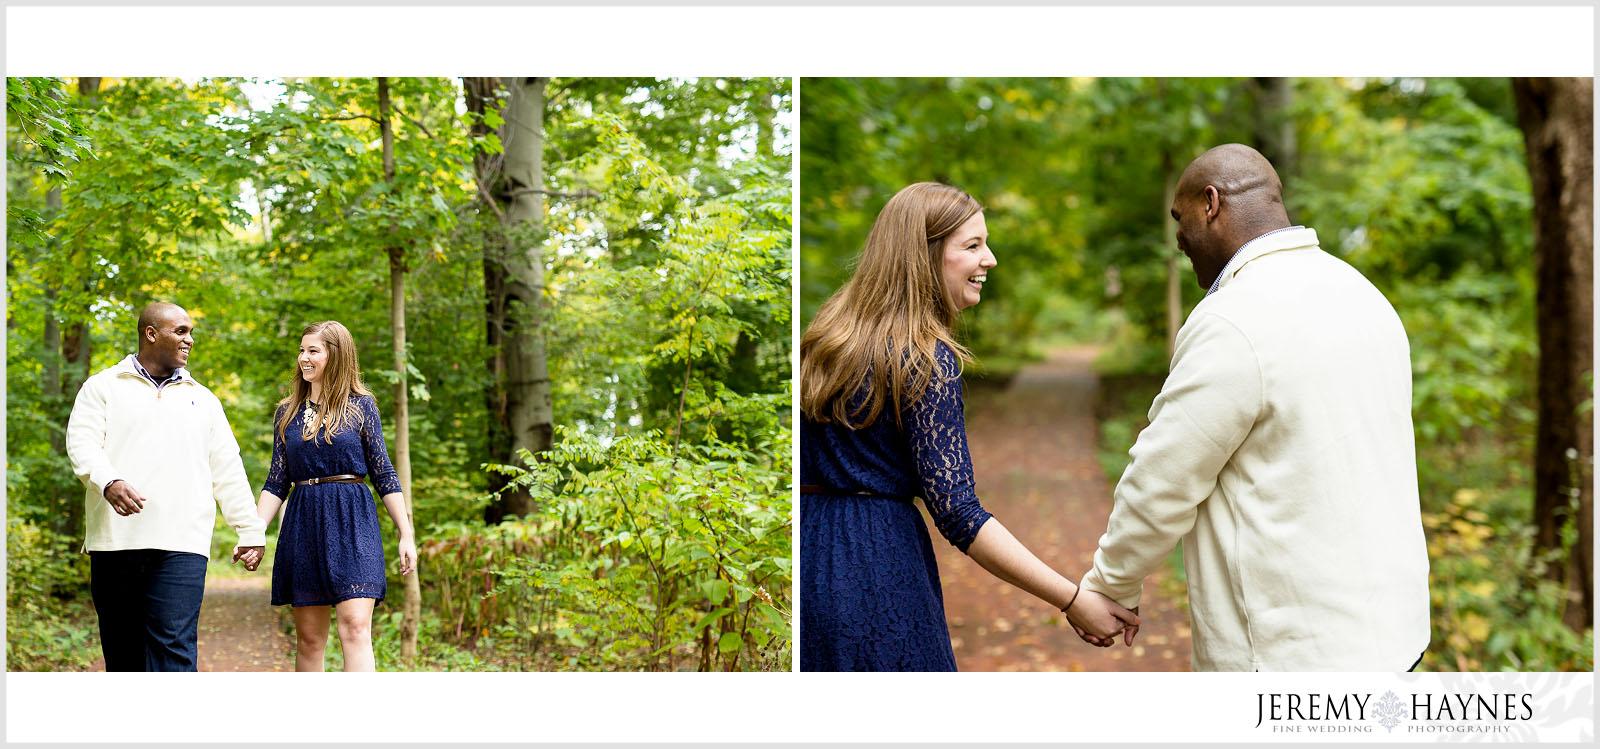 01-indiana-university-campus-dunn's-woods-bloomington-engagement-photos.jpg